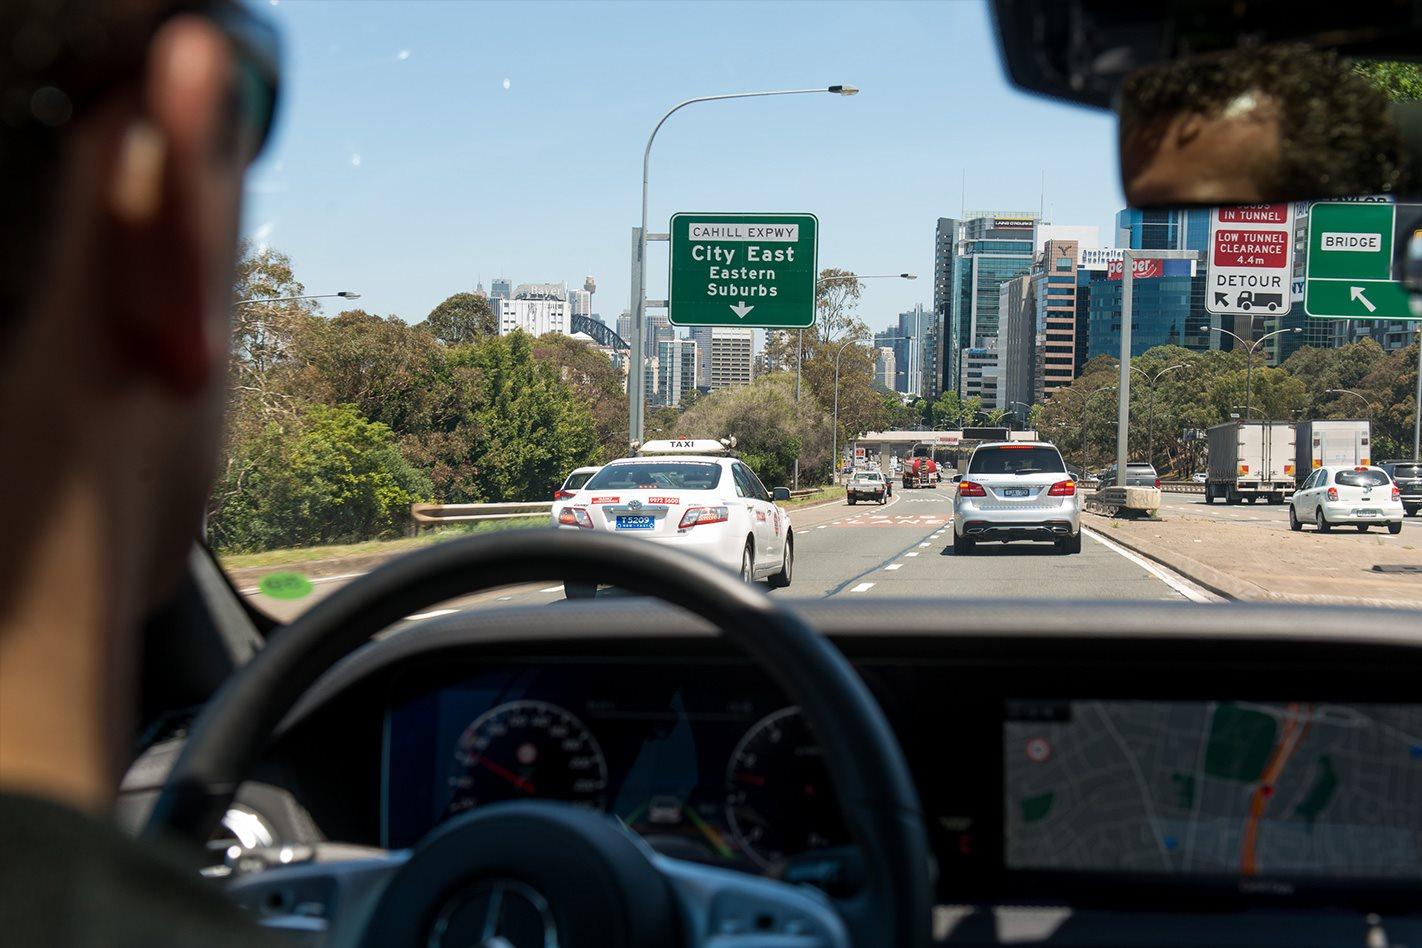 We ride shotgun in an autonomous Mercedes S-class at 110kp/h